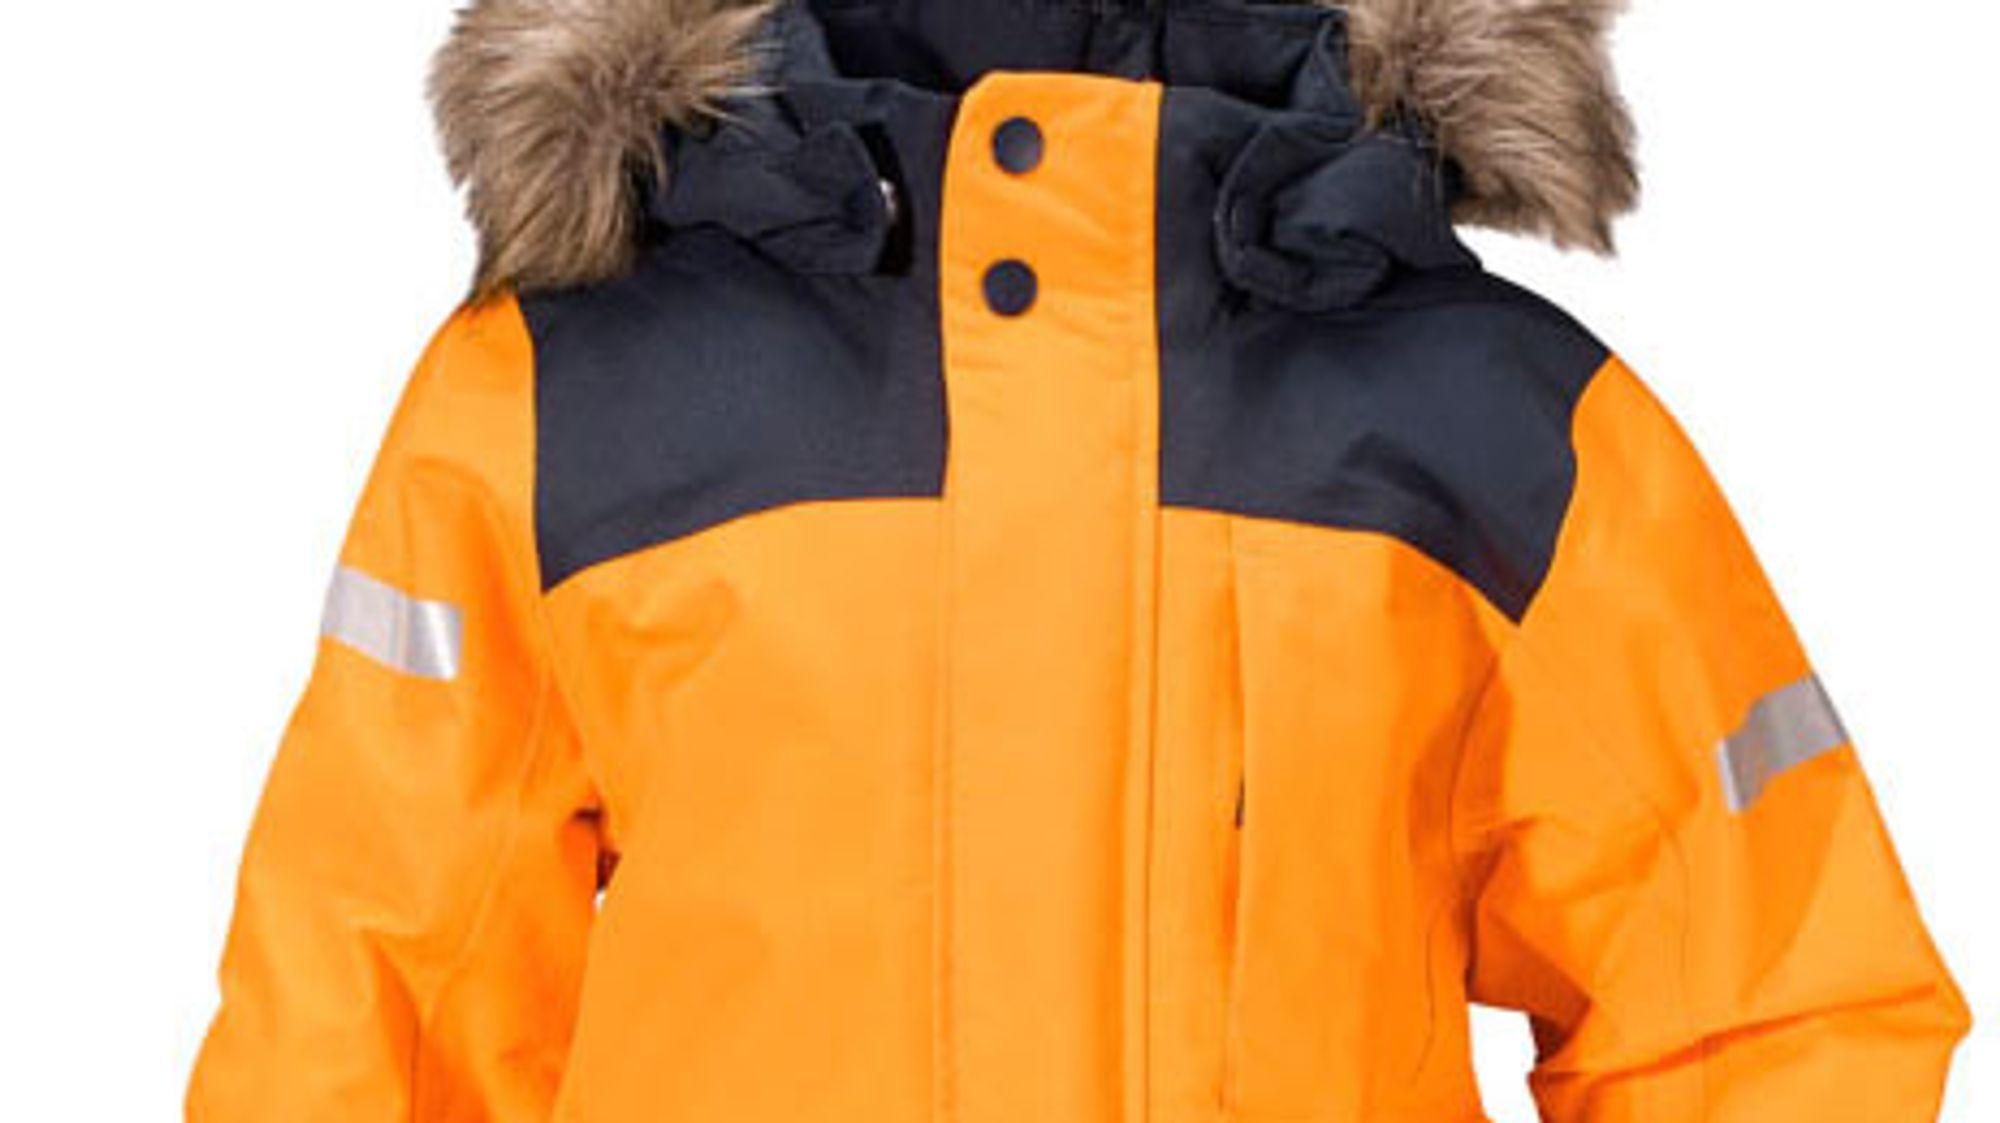 4d3c035f Didriksons Bjørnen er av svenske Testfakta kåret til årets beste vinterdress  - i konkurranse med ni